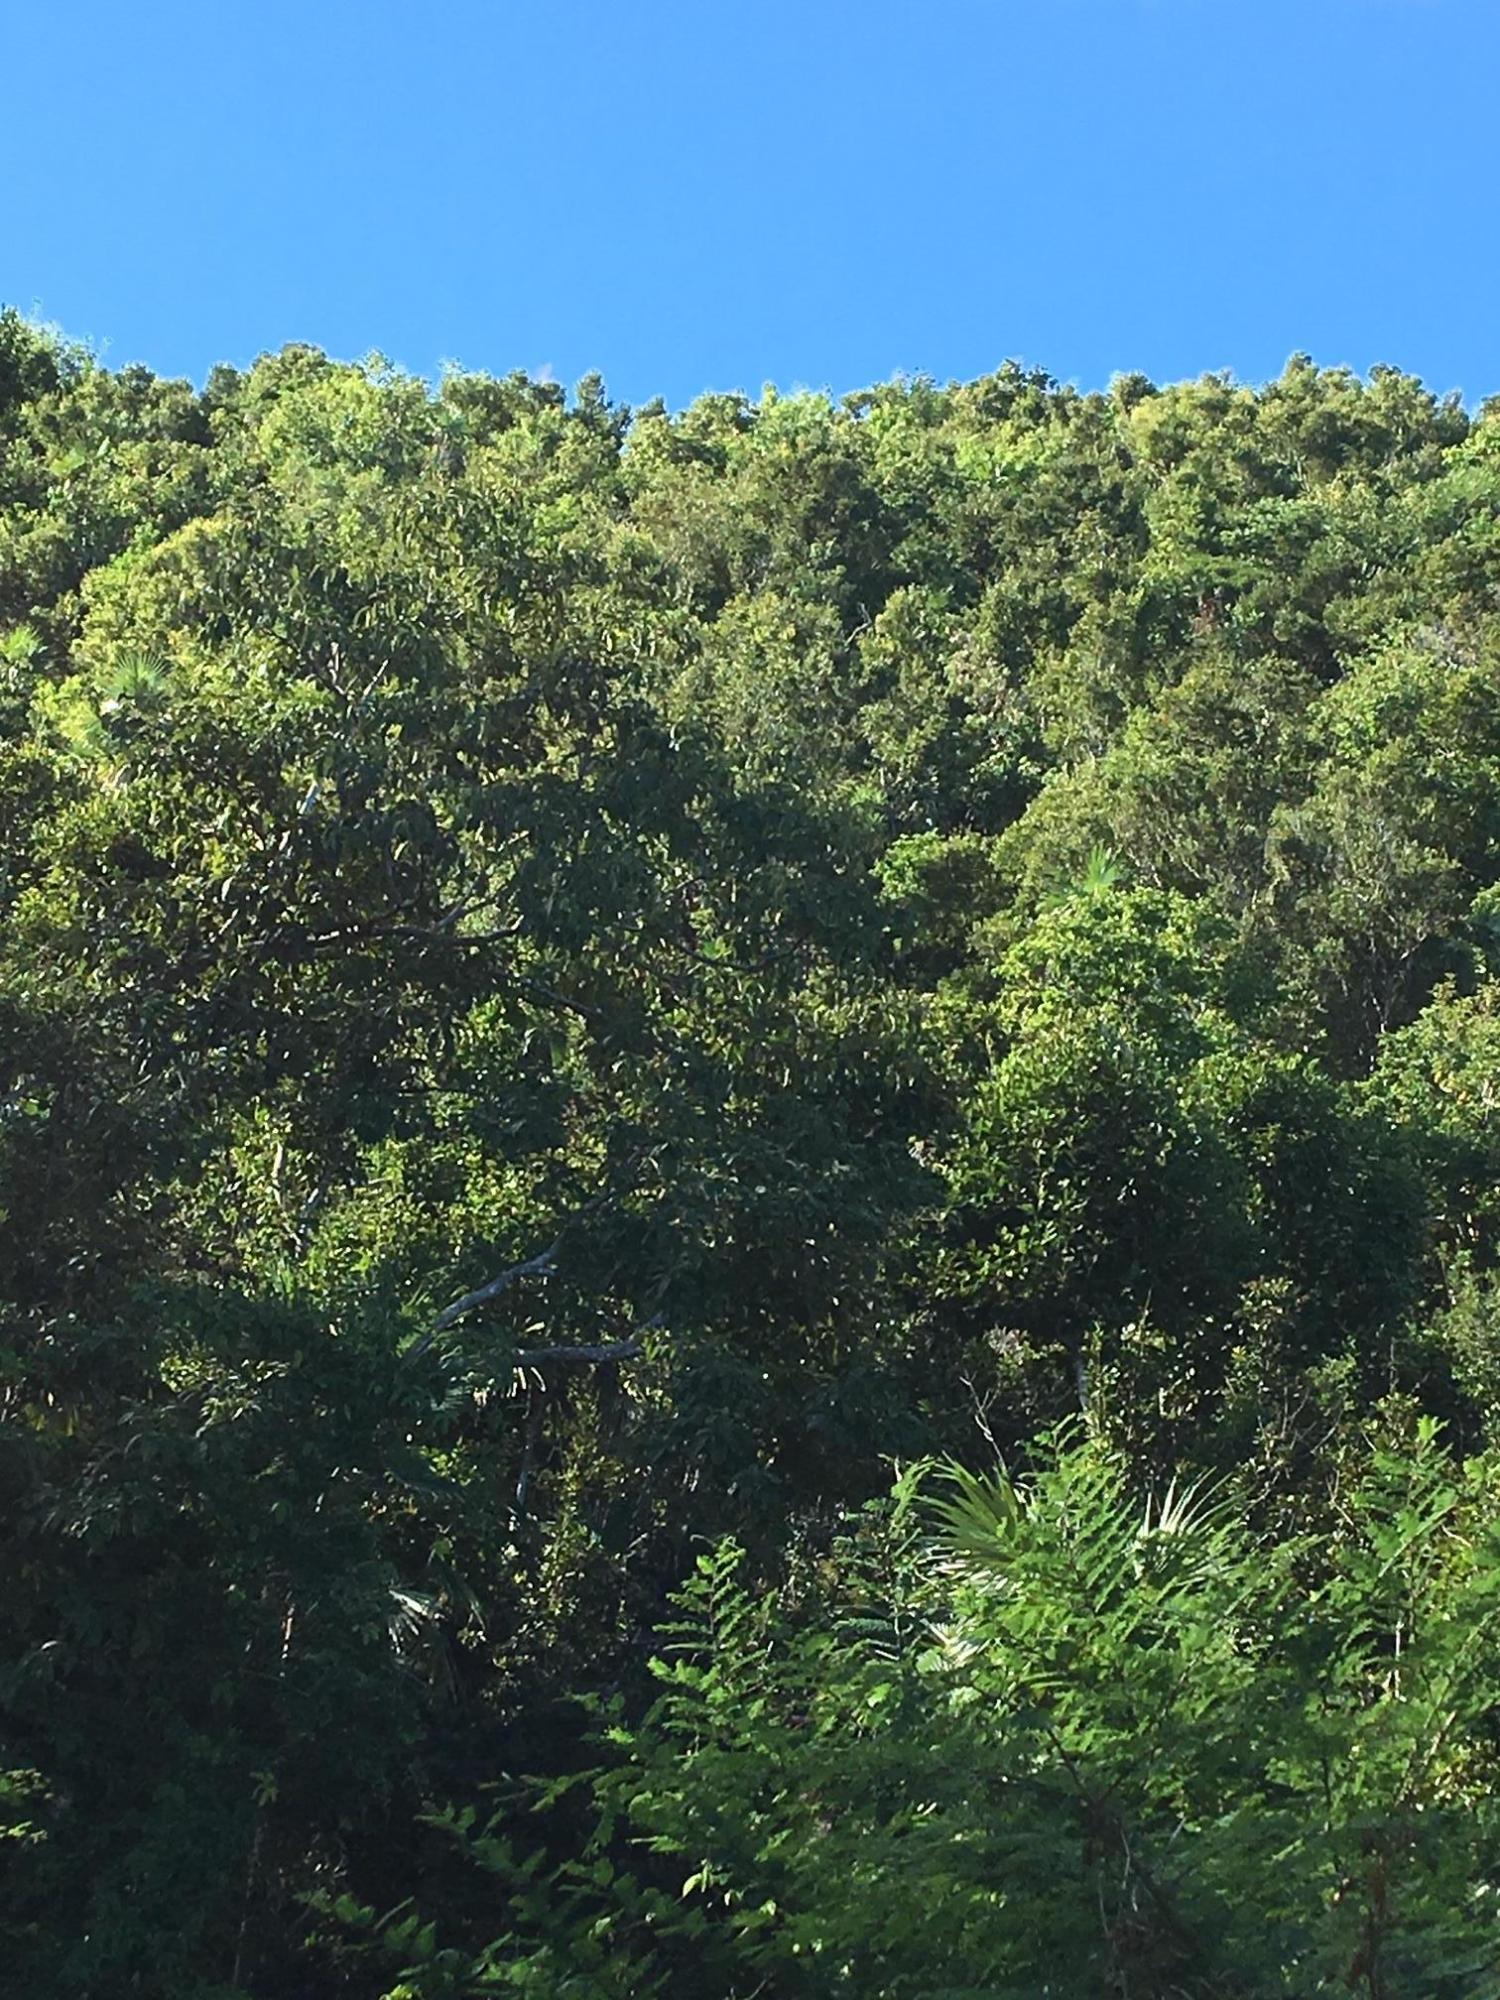 Land for Sale at 11-4 Botany Bay WE 11-4 Botany Bay WE St Thomas, Virgin Islands 00802 United States Virgin Islands